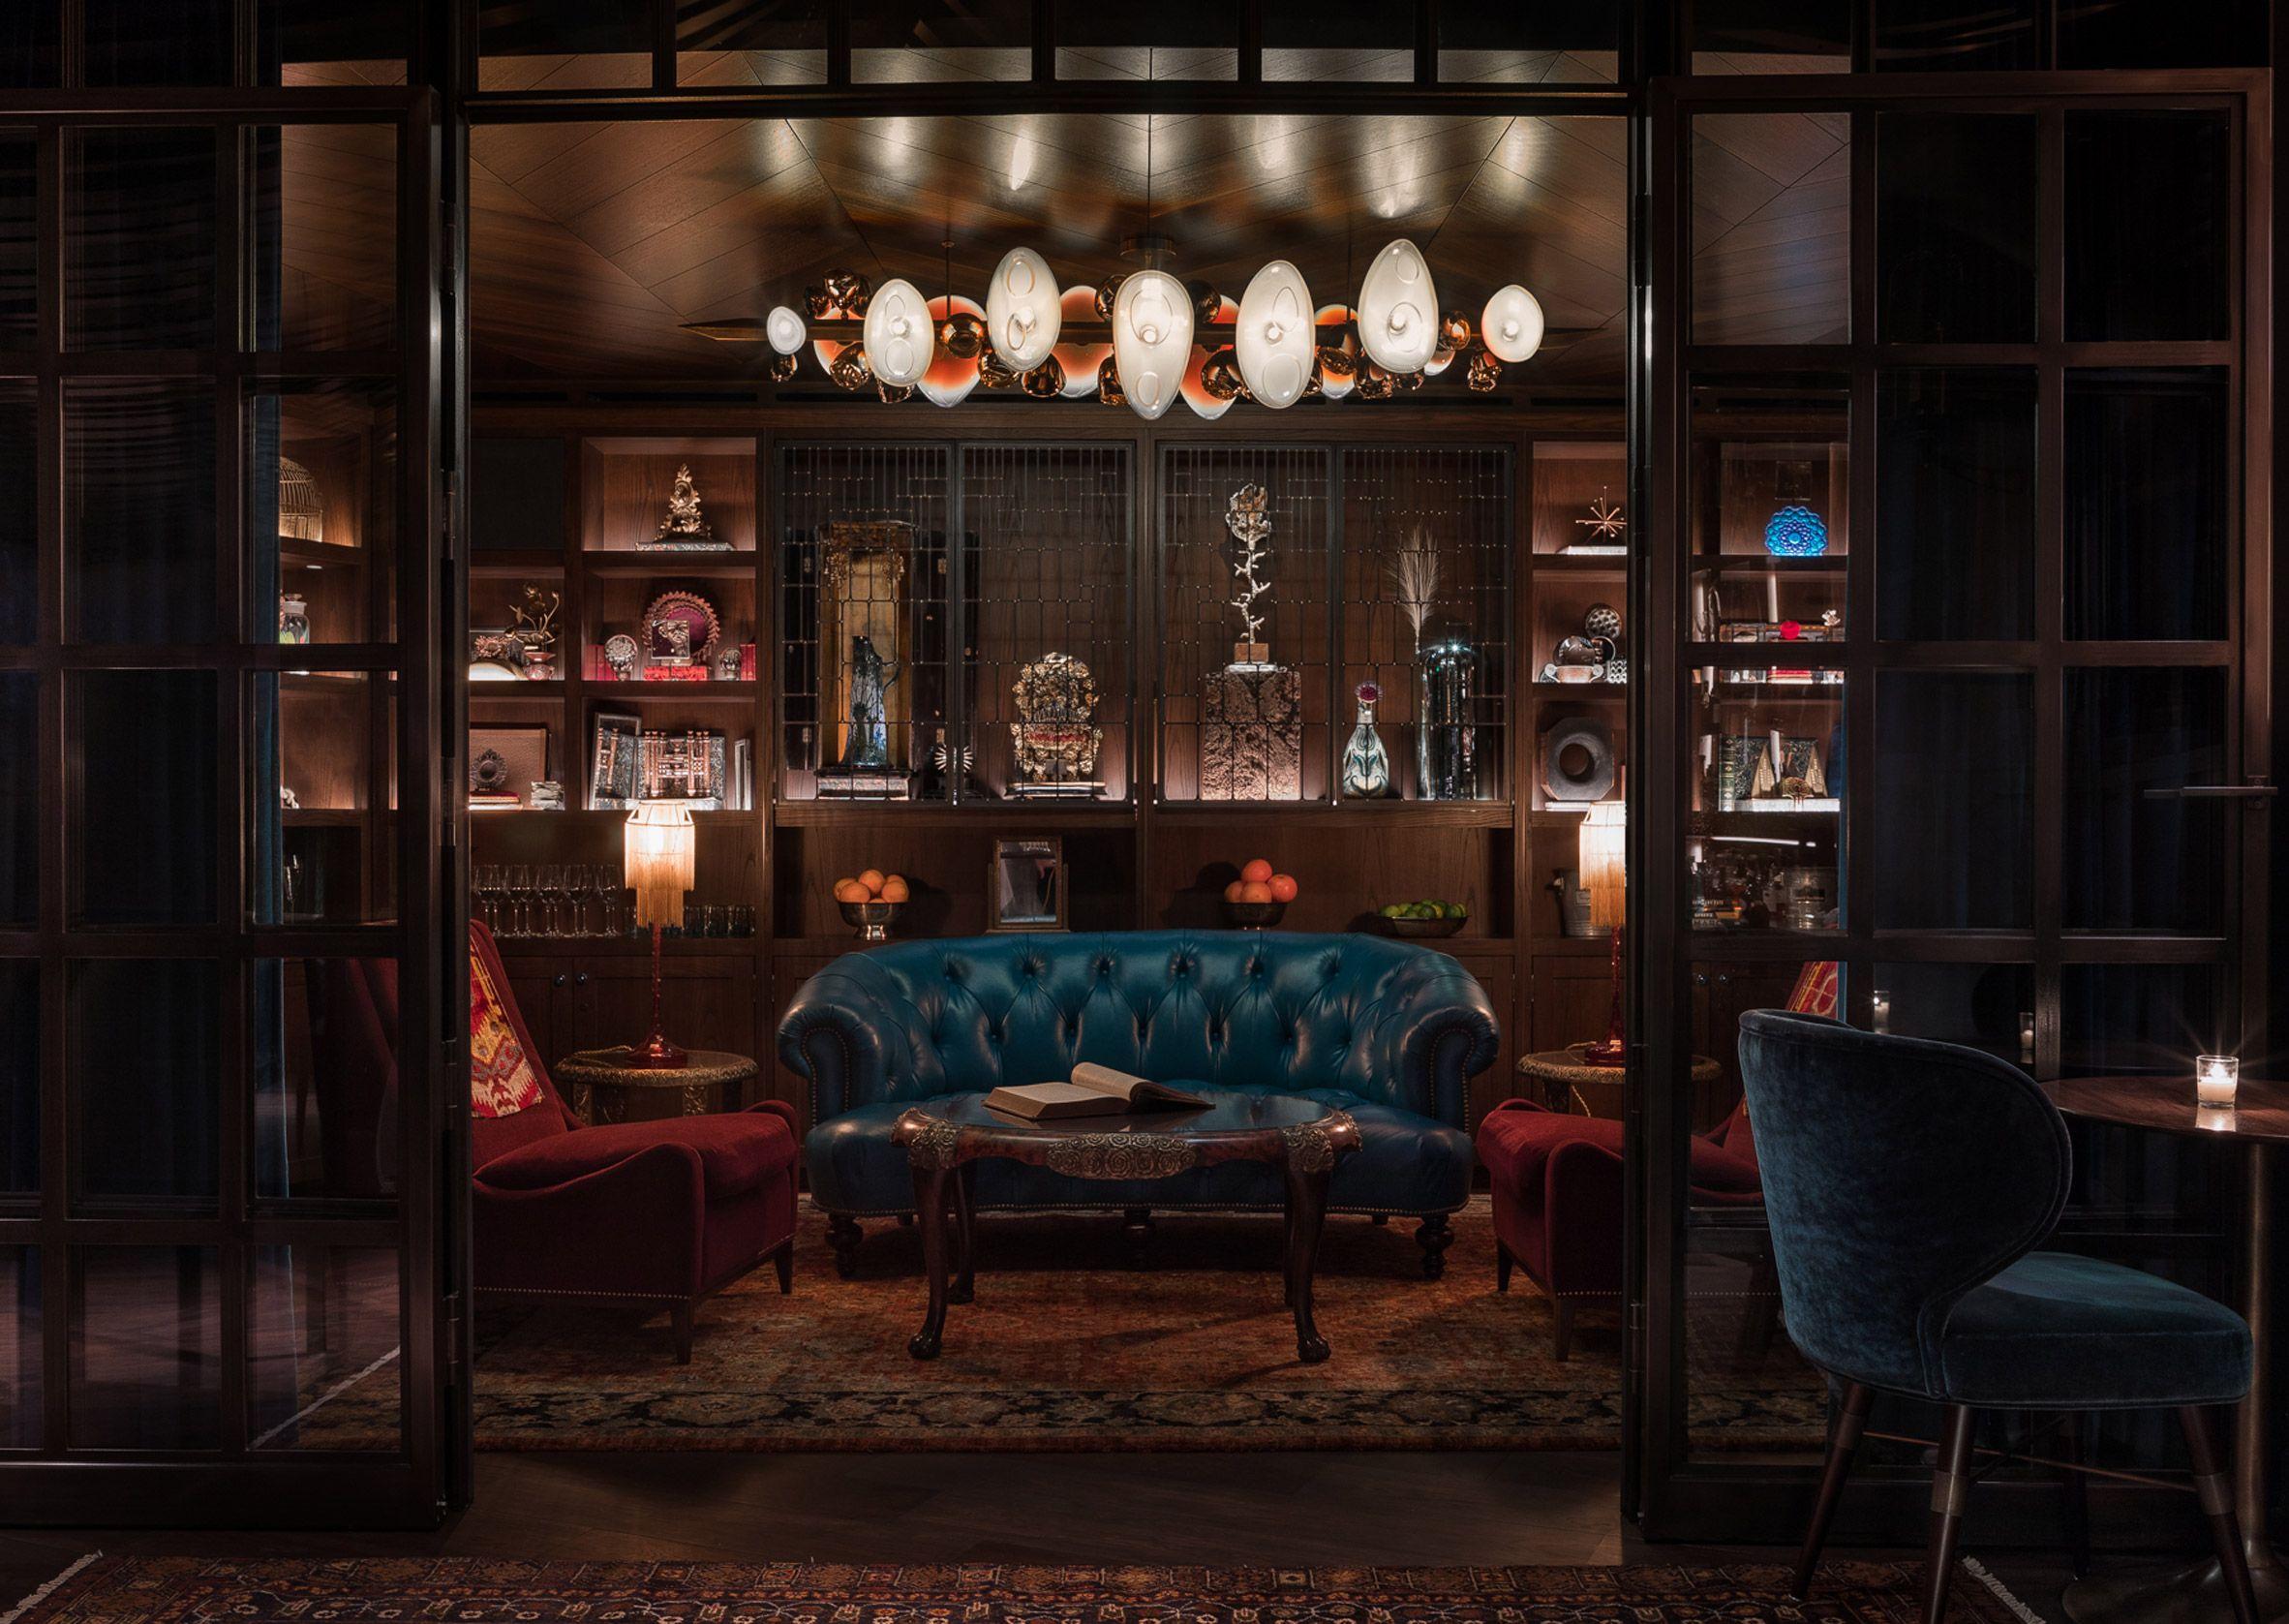 Deep Dive Bar Iconic Bar In 2020 Moody Interior Design Bar Interior Moody Interiors